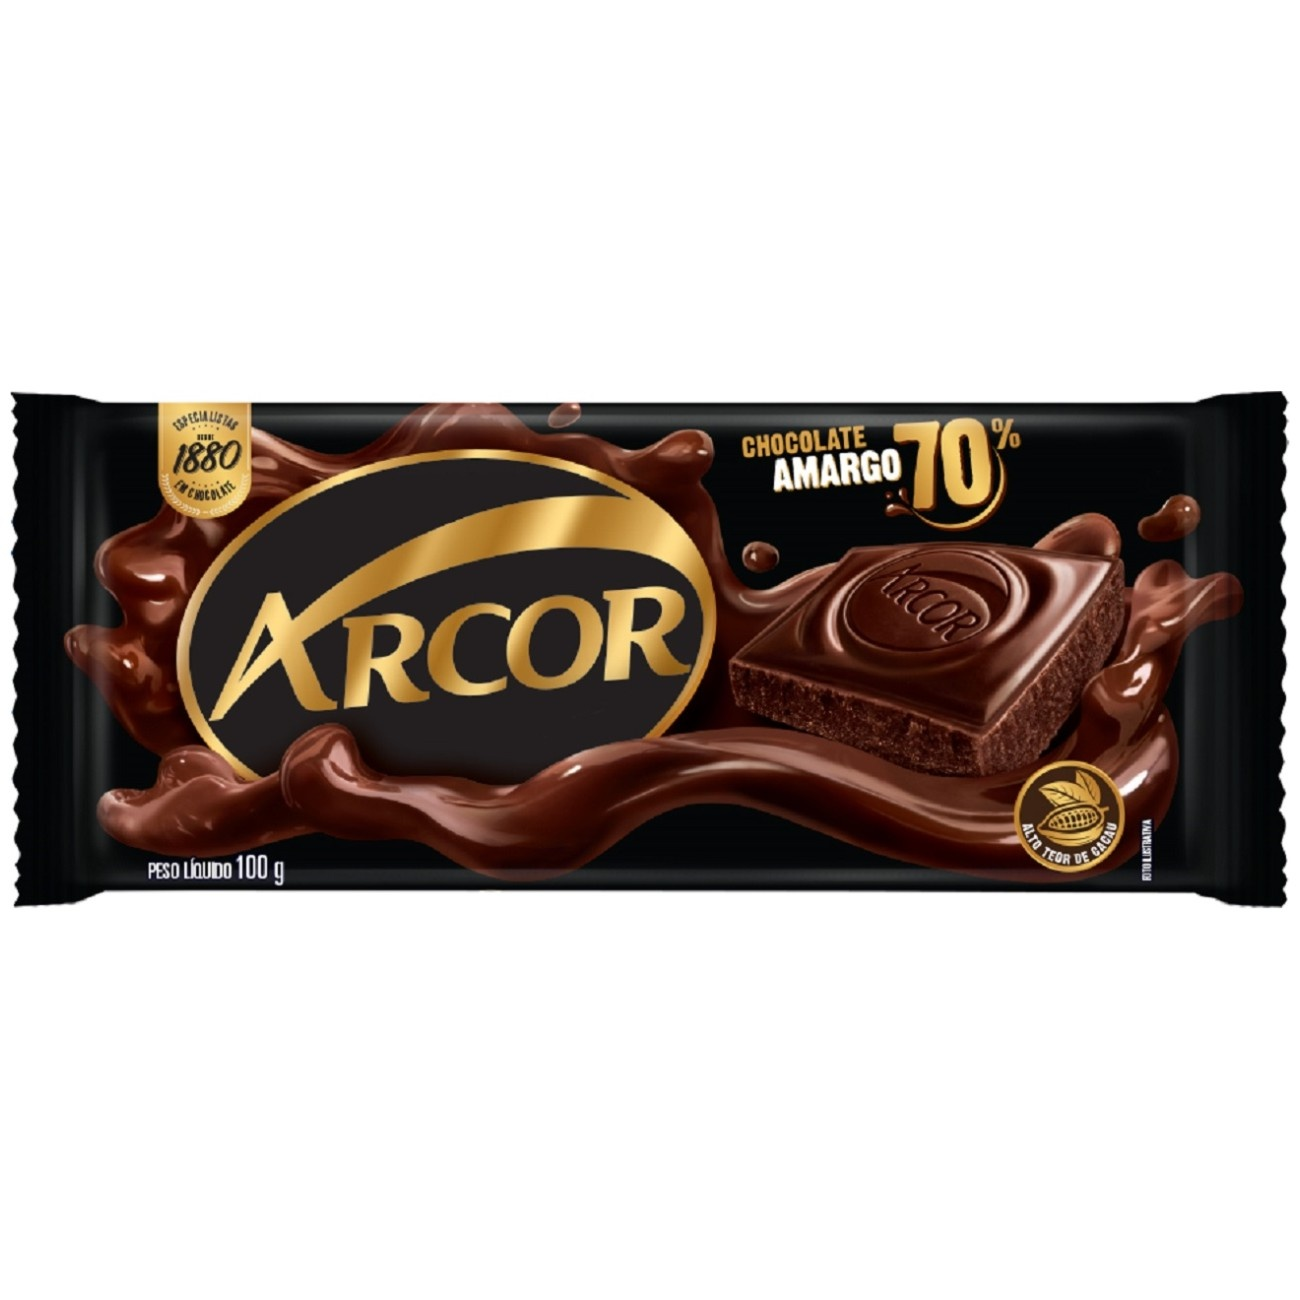 Display de Tablete de Chocolate Arcor Amargo 70% Cacau 100g (14 un/cada)